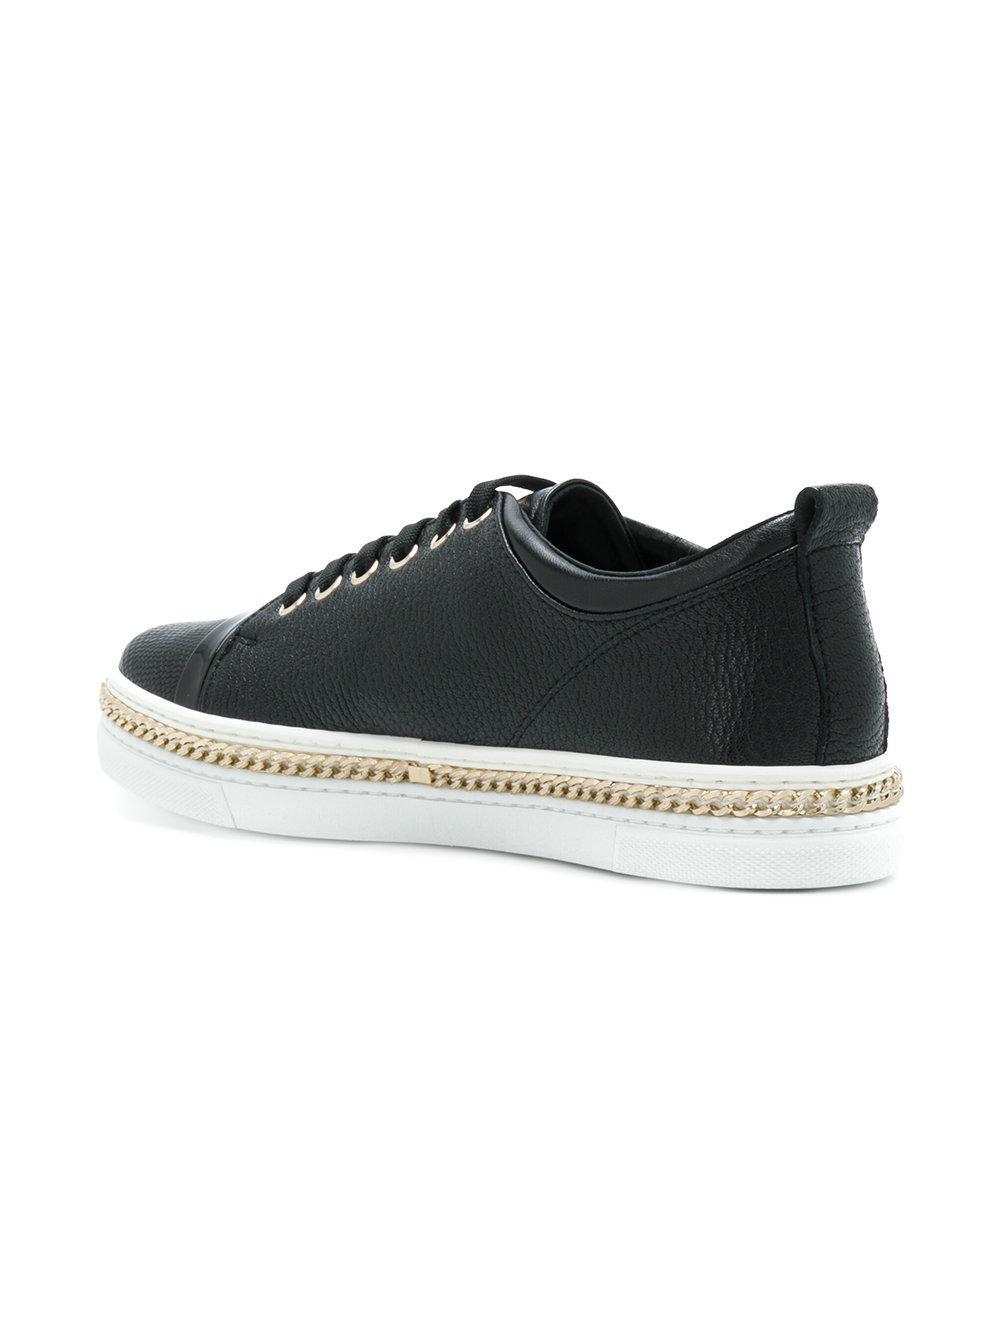 Lanvin Black Chain Reaction Sneakers zzgt69